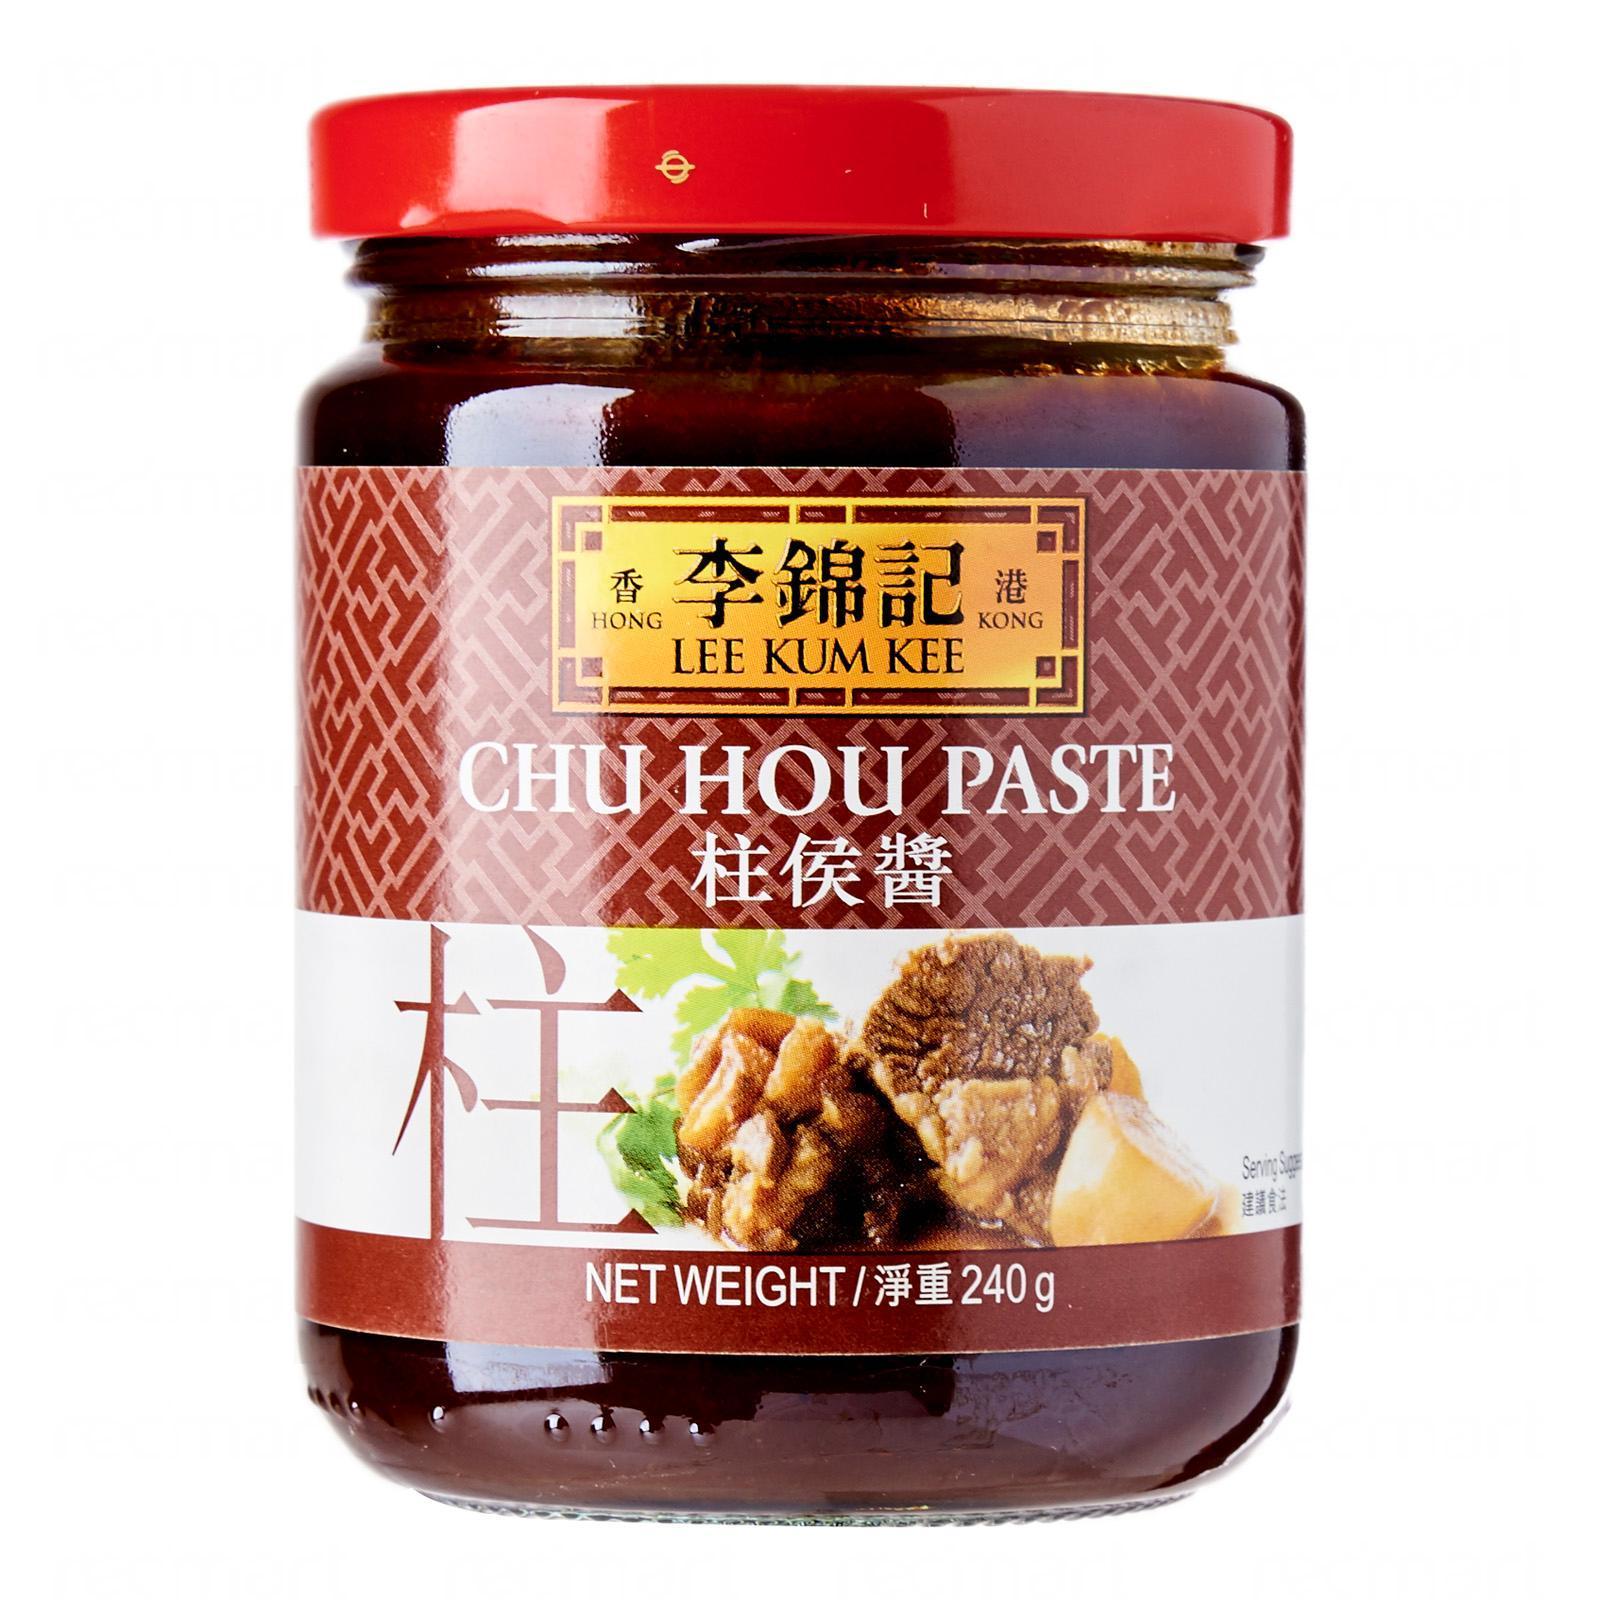 Lee Kum Kee Chu Hou Paste Cooking Sauce